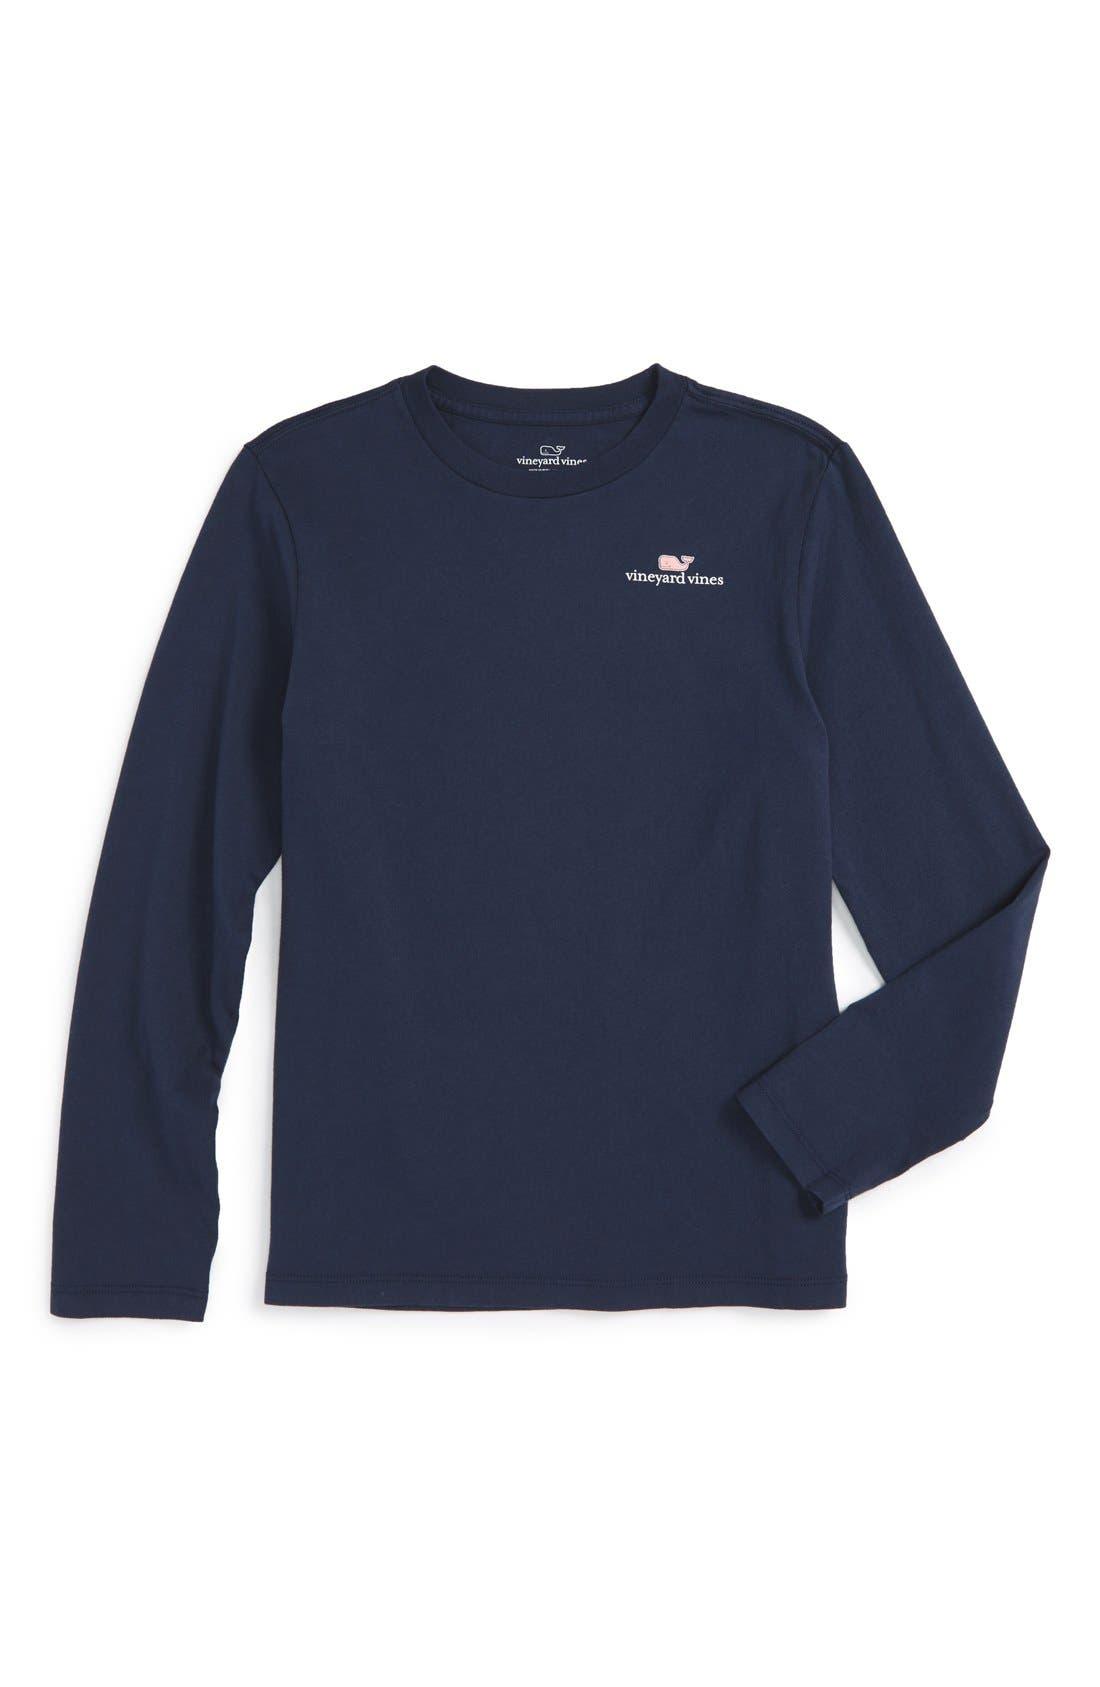 Alternate Image 1 Selected - Vineyard Vines Logo Graphic Long Sleeve T-Shirt (Big Boys)